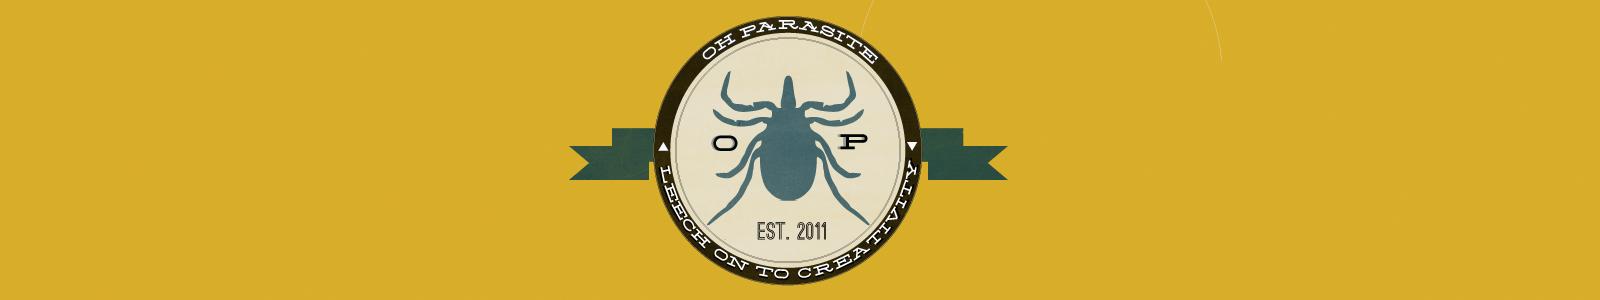 OH! Parasite